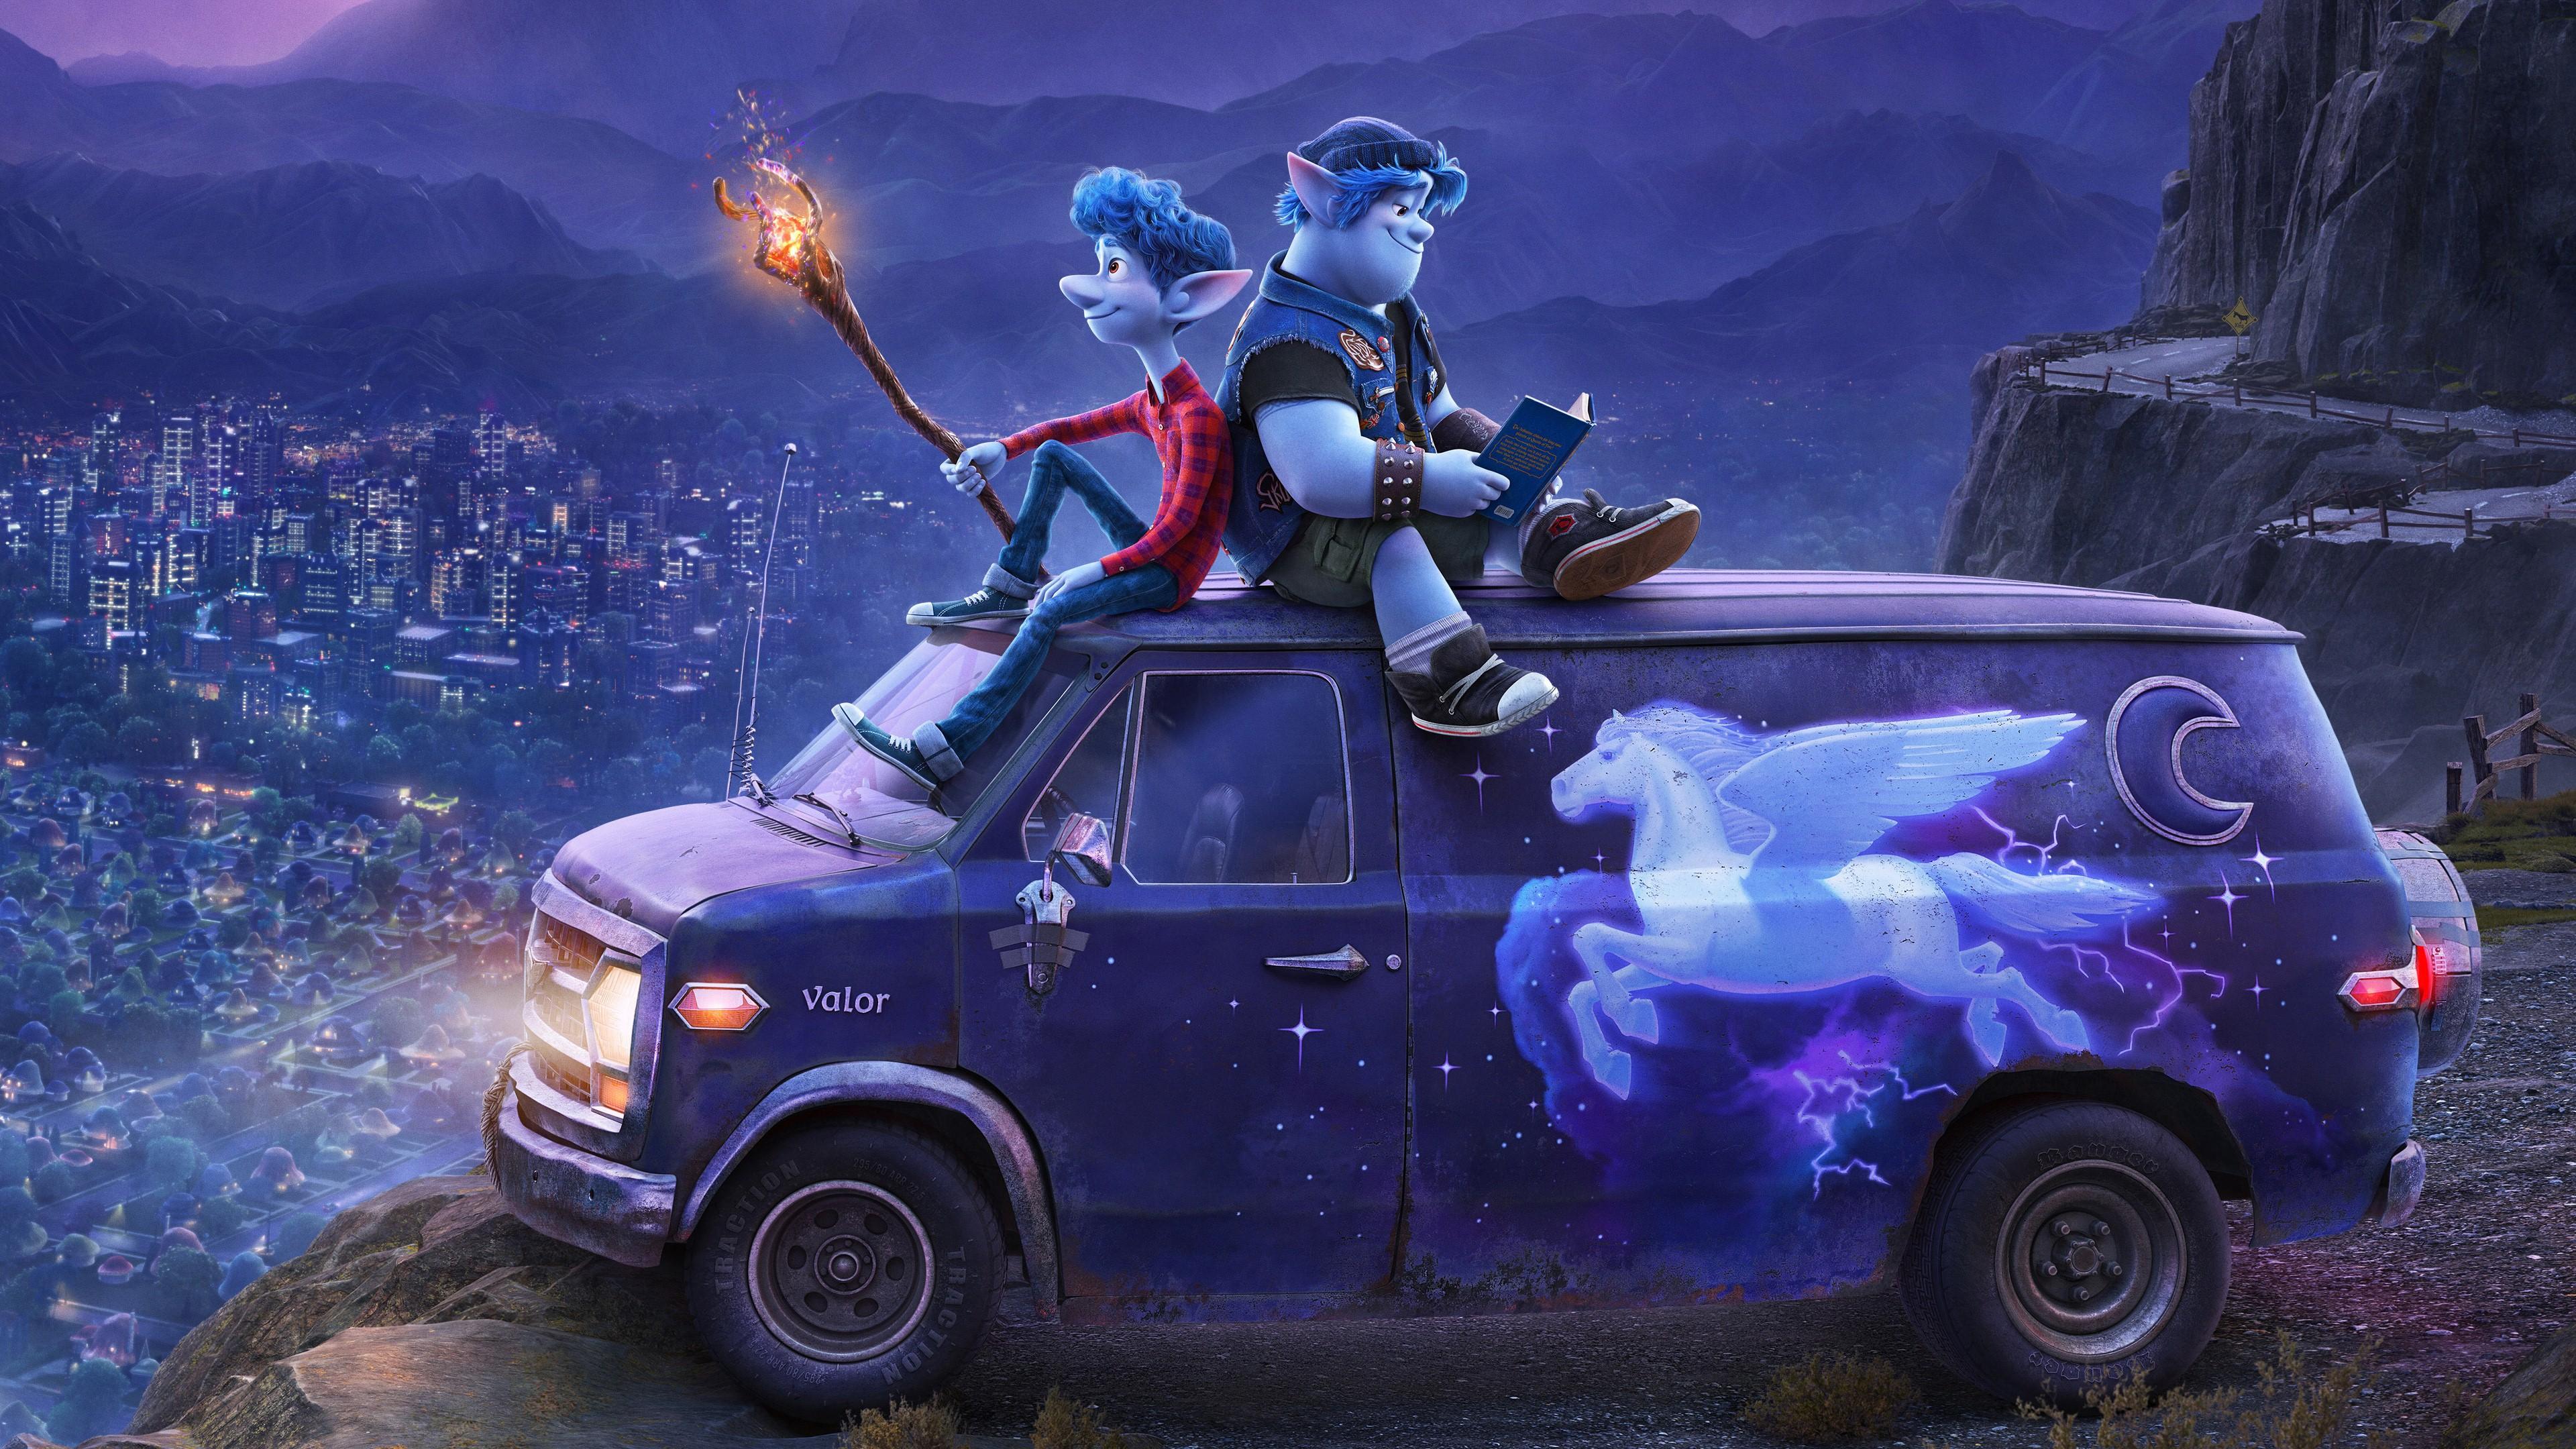 2020 Animation Film Onward Wallpaper 2020 Movie Wallpaper Hd 2899278 Hd Wallpaper Backgrounds Download